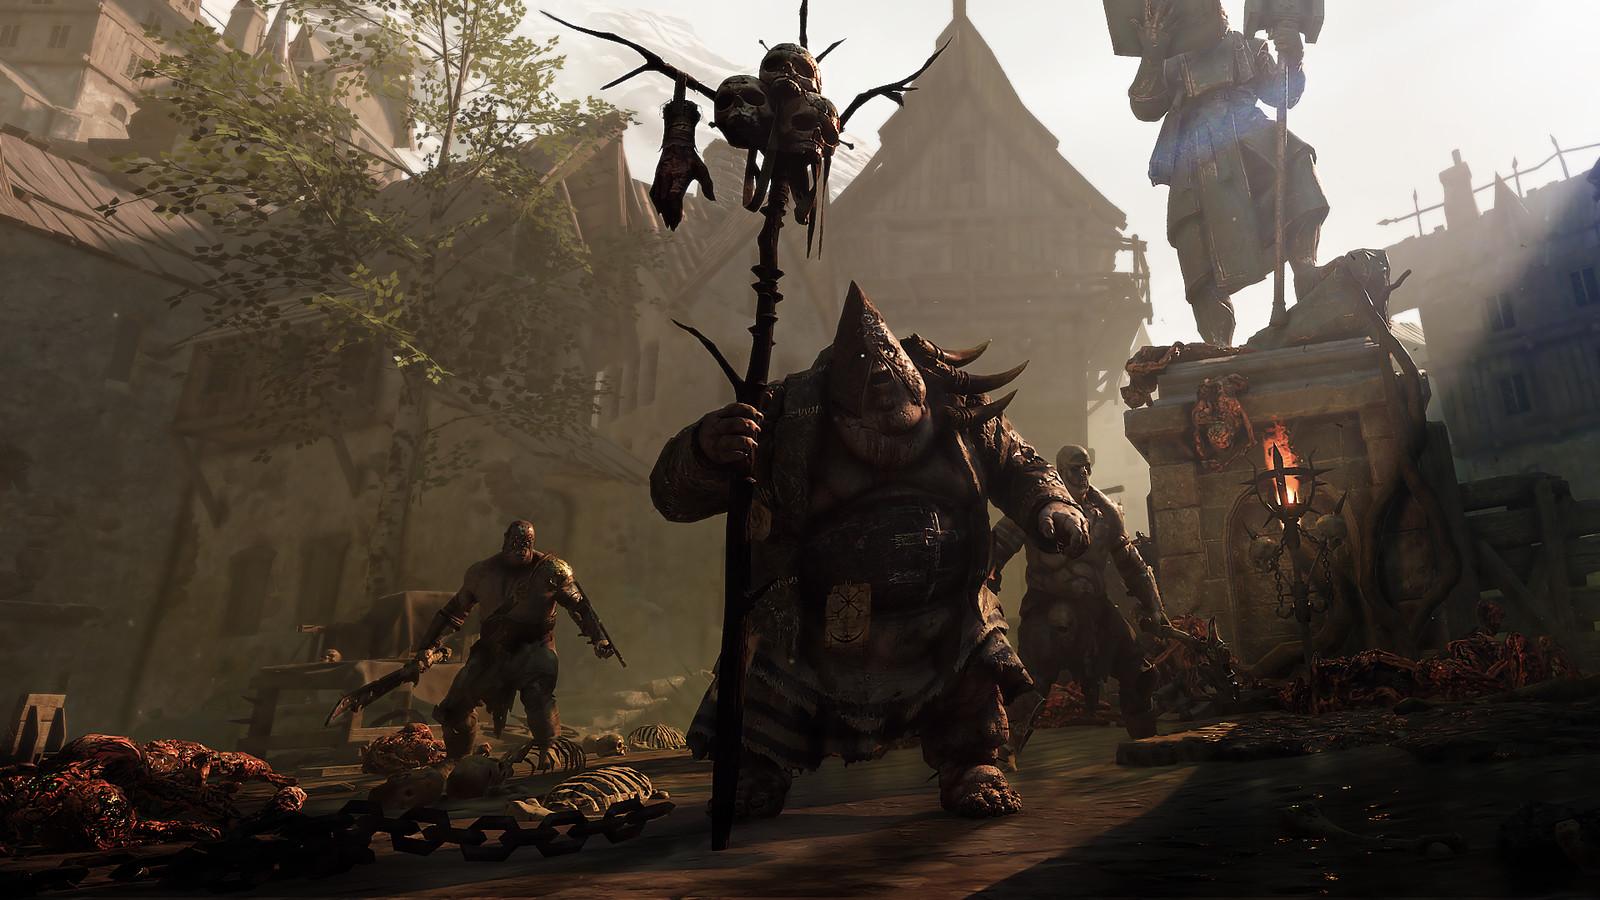 In-game screenshot by Fatshark's marketing team